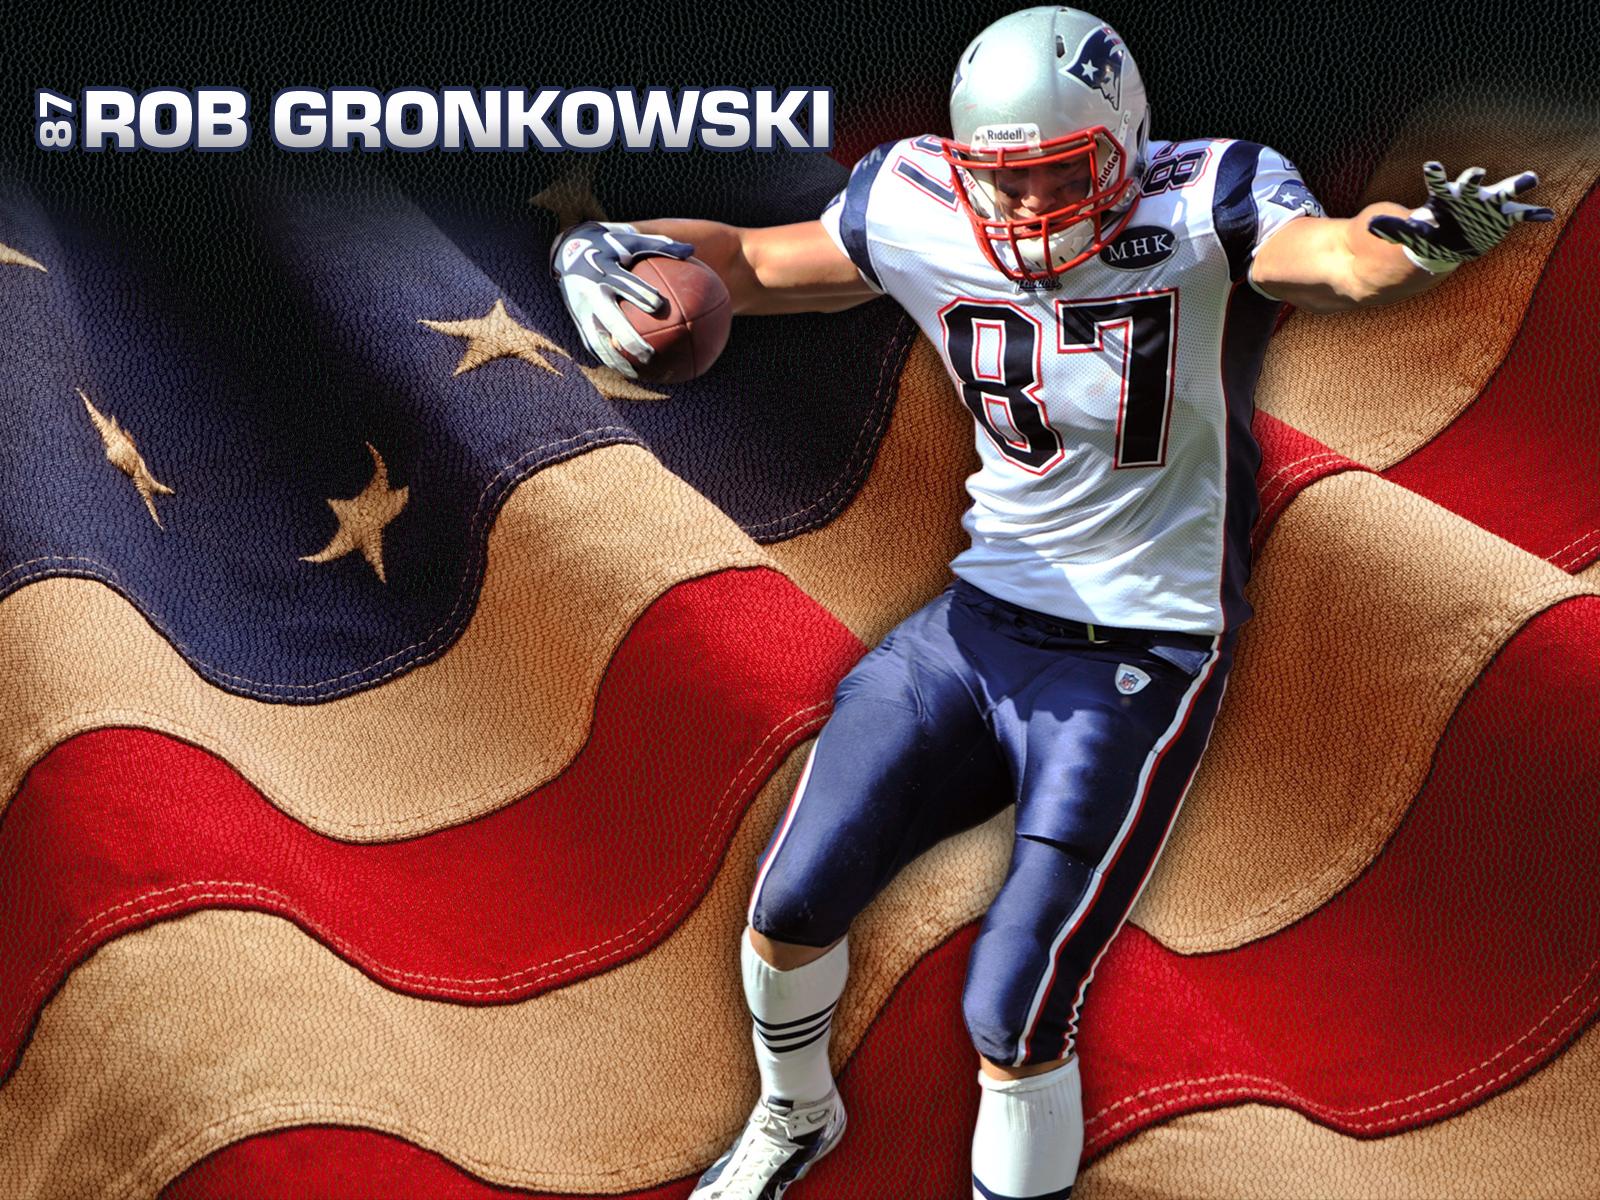 2015 New England Patriots Champions Wallpaper Image Gallery 1600x1200